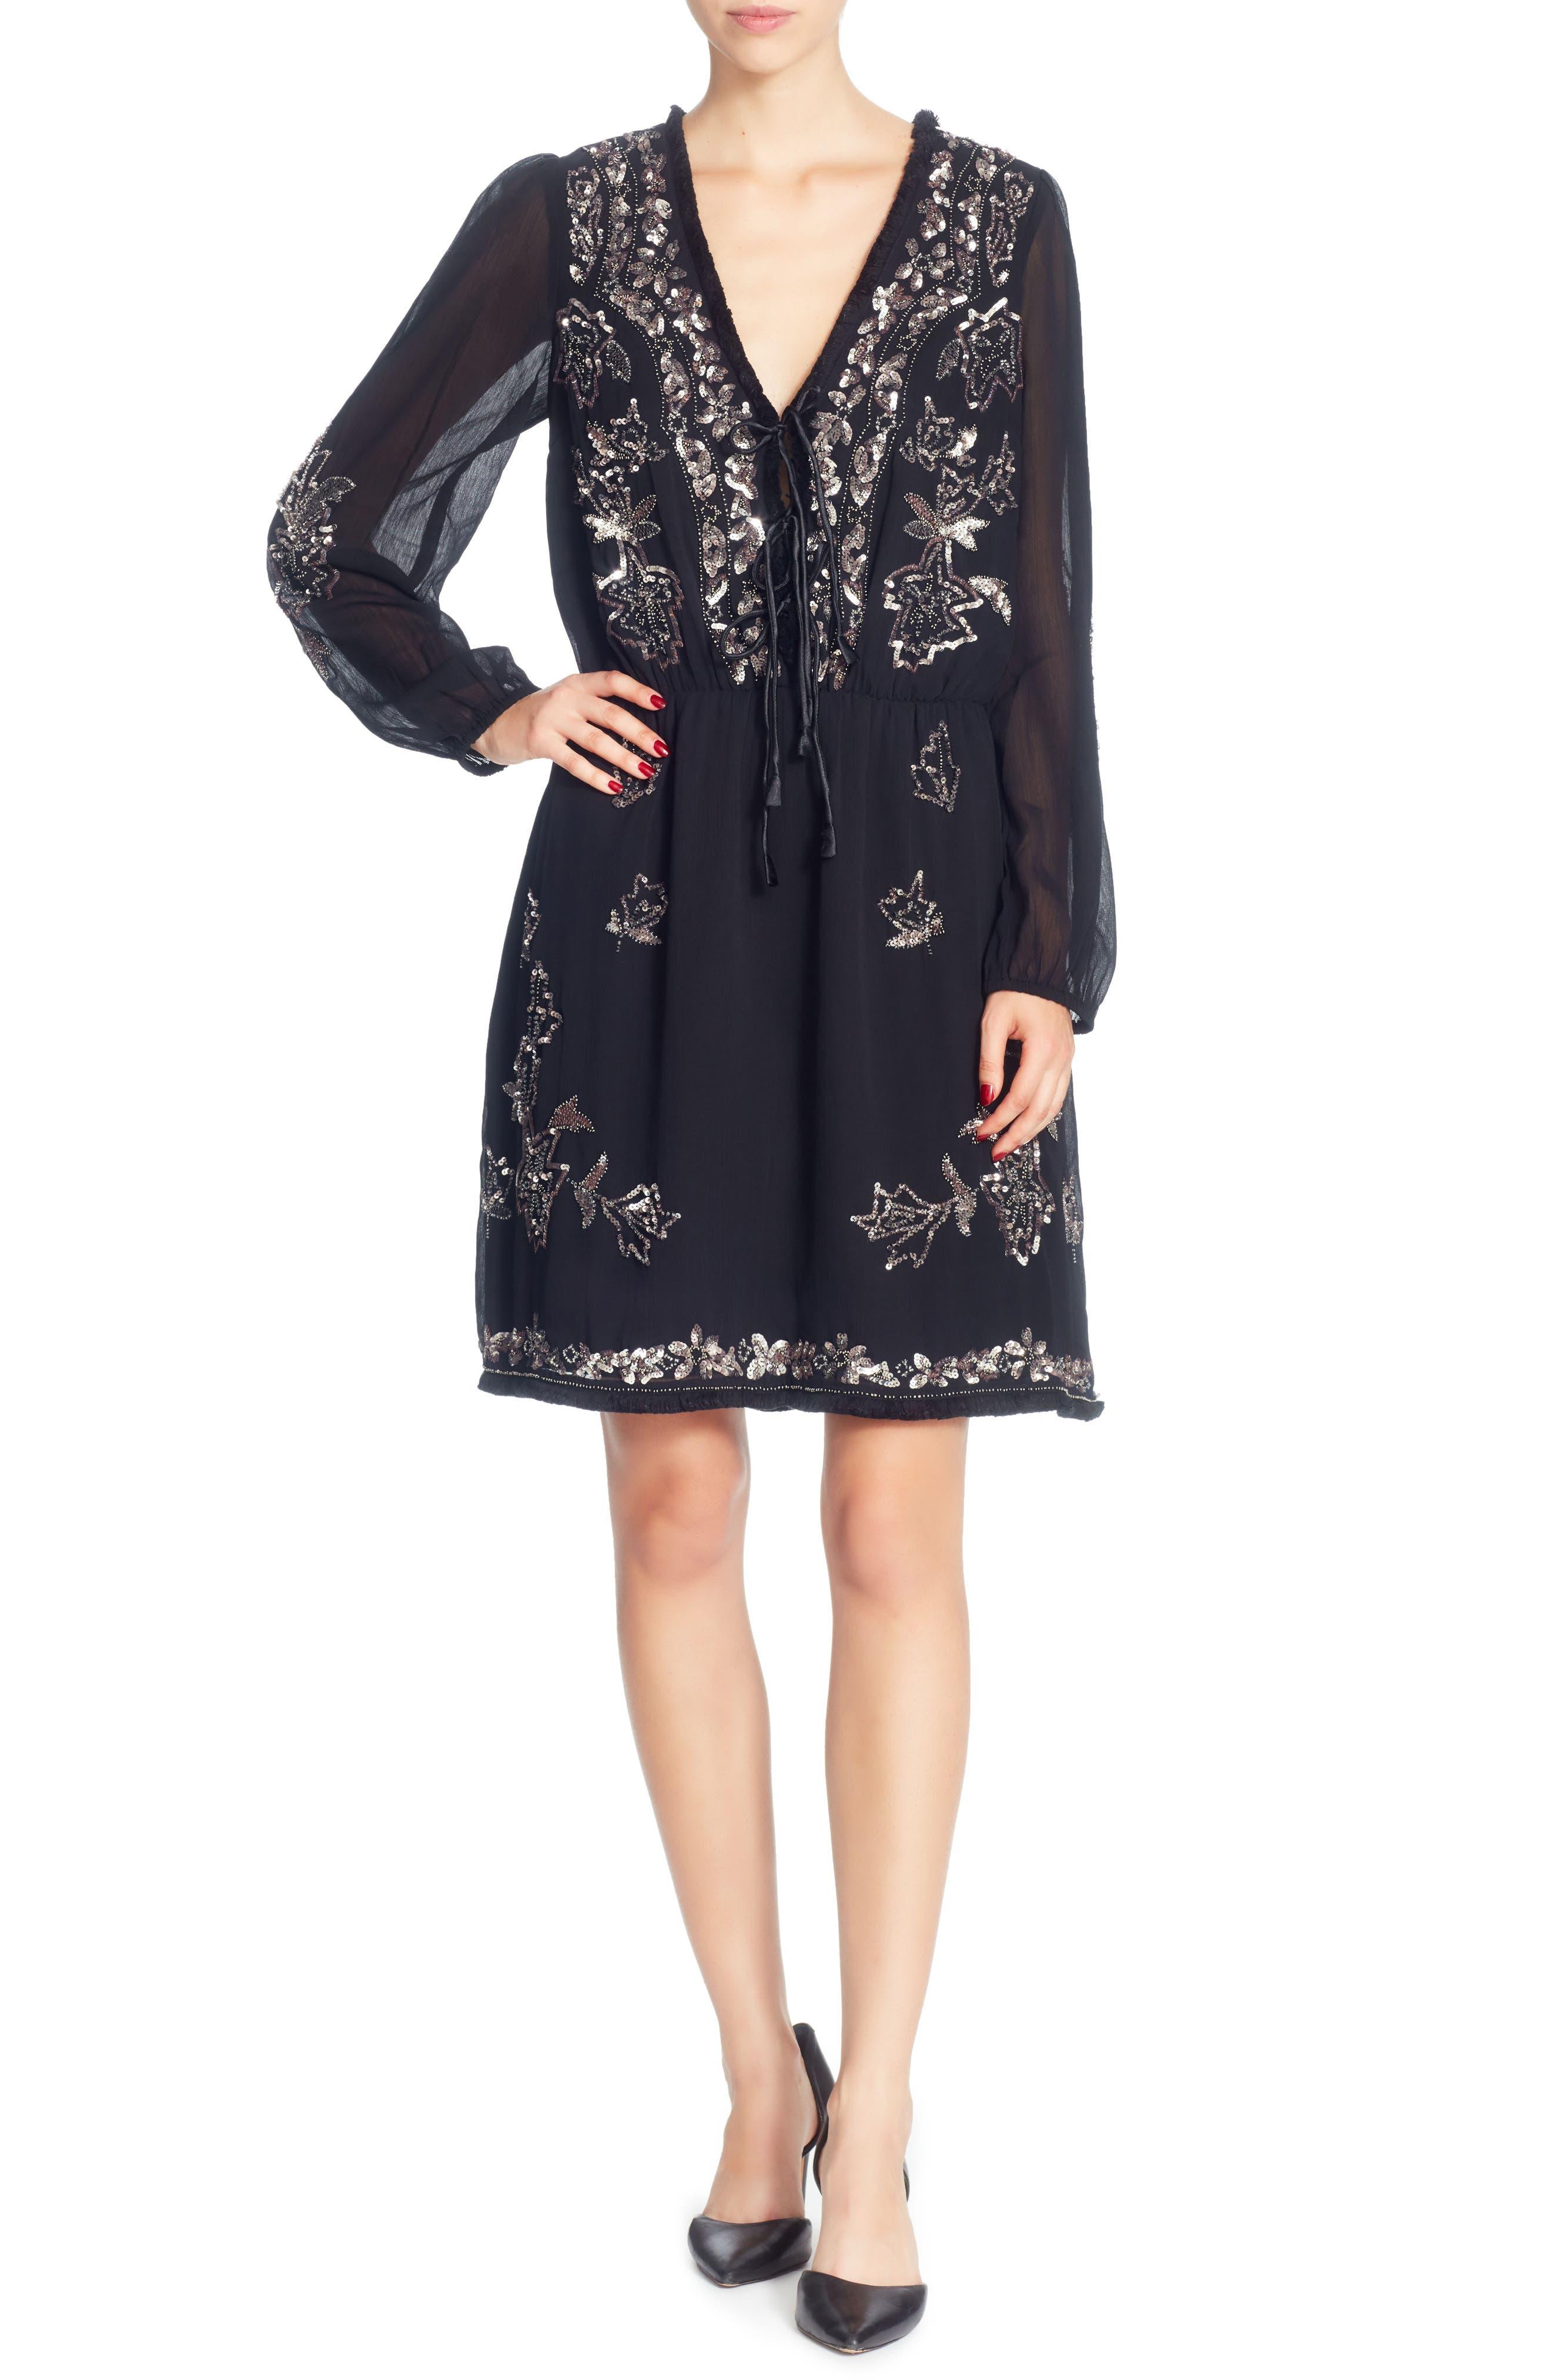 Gretl Dress,                         Main,                         color,